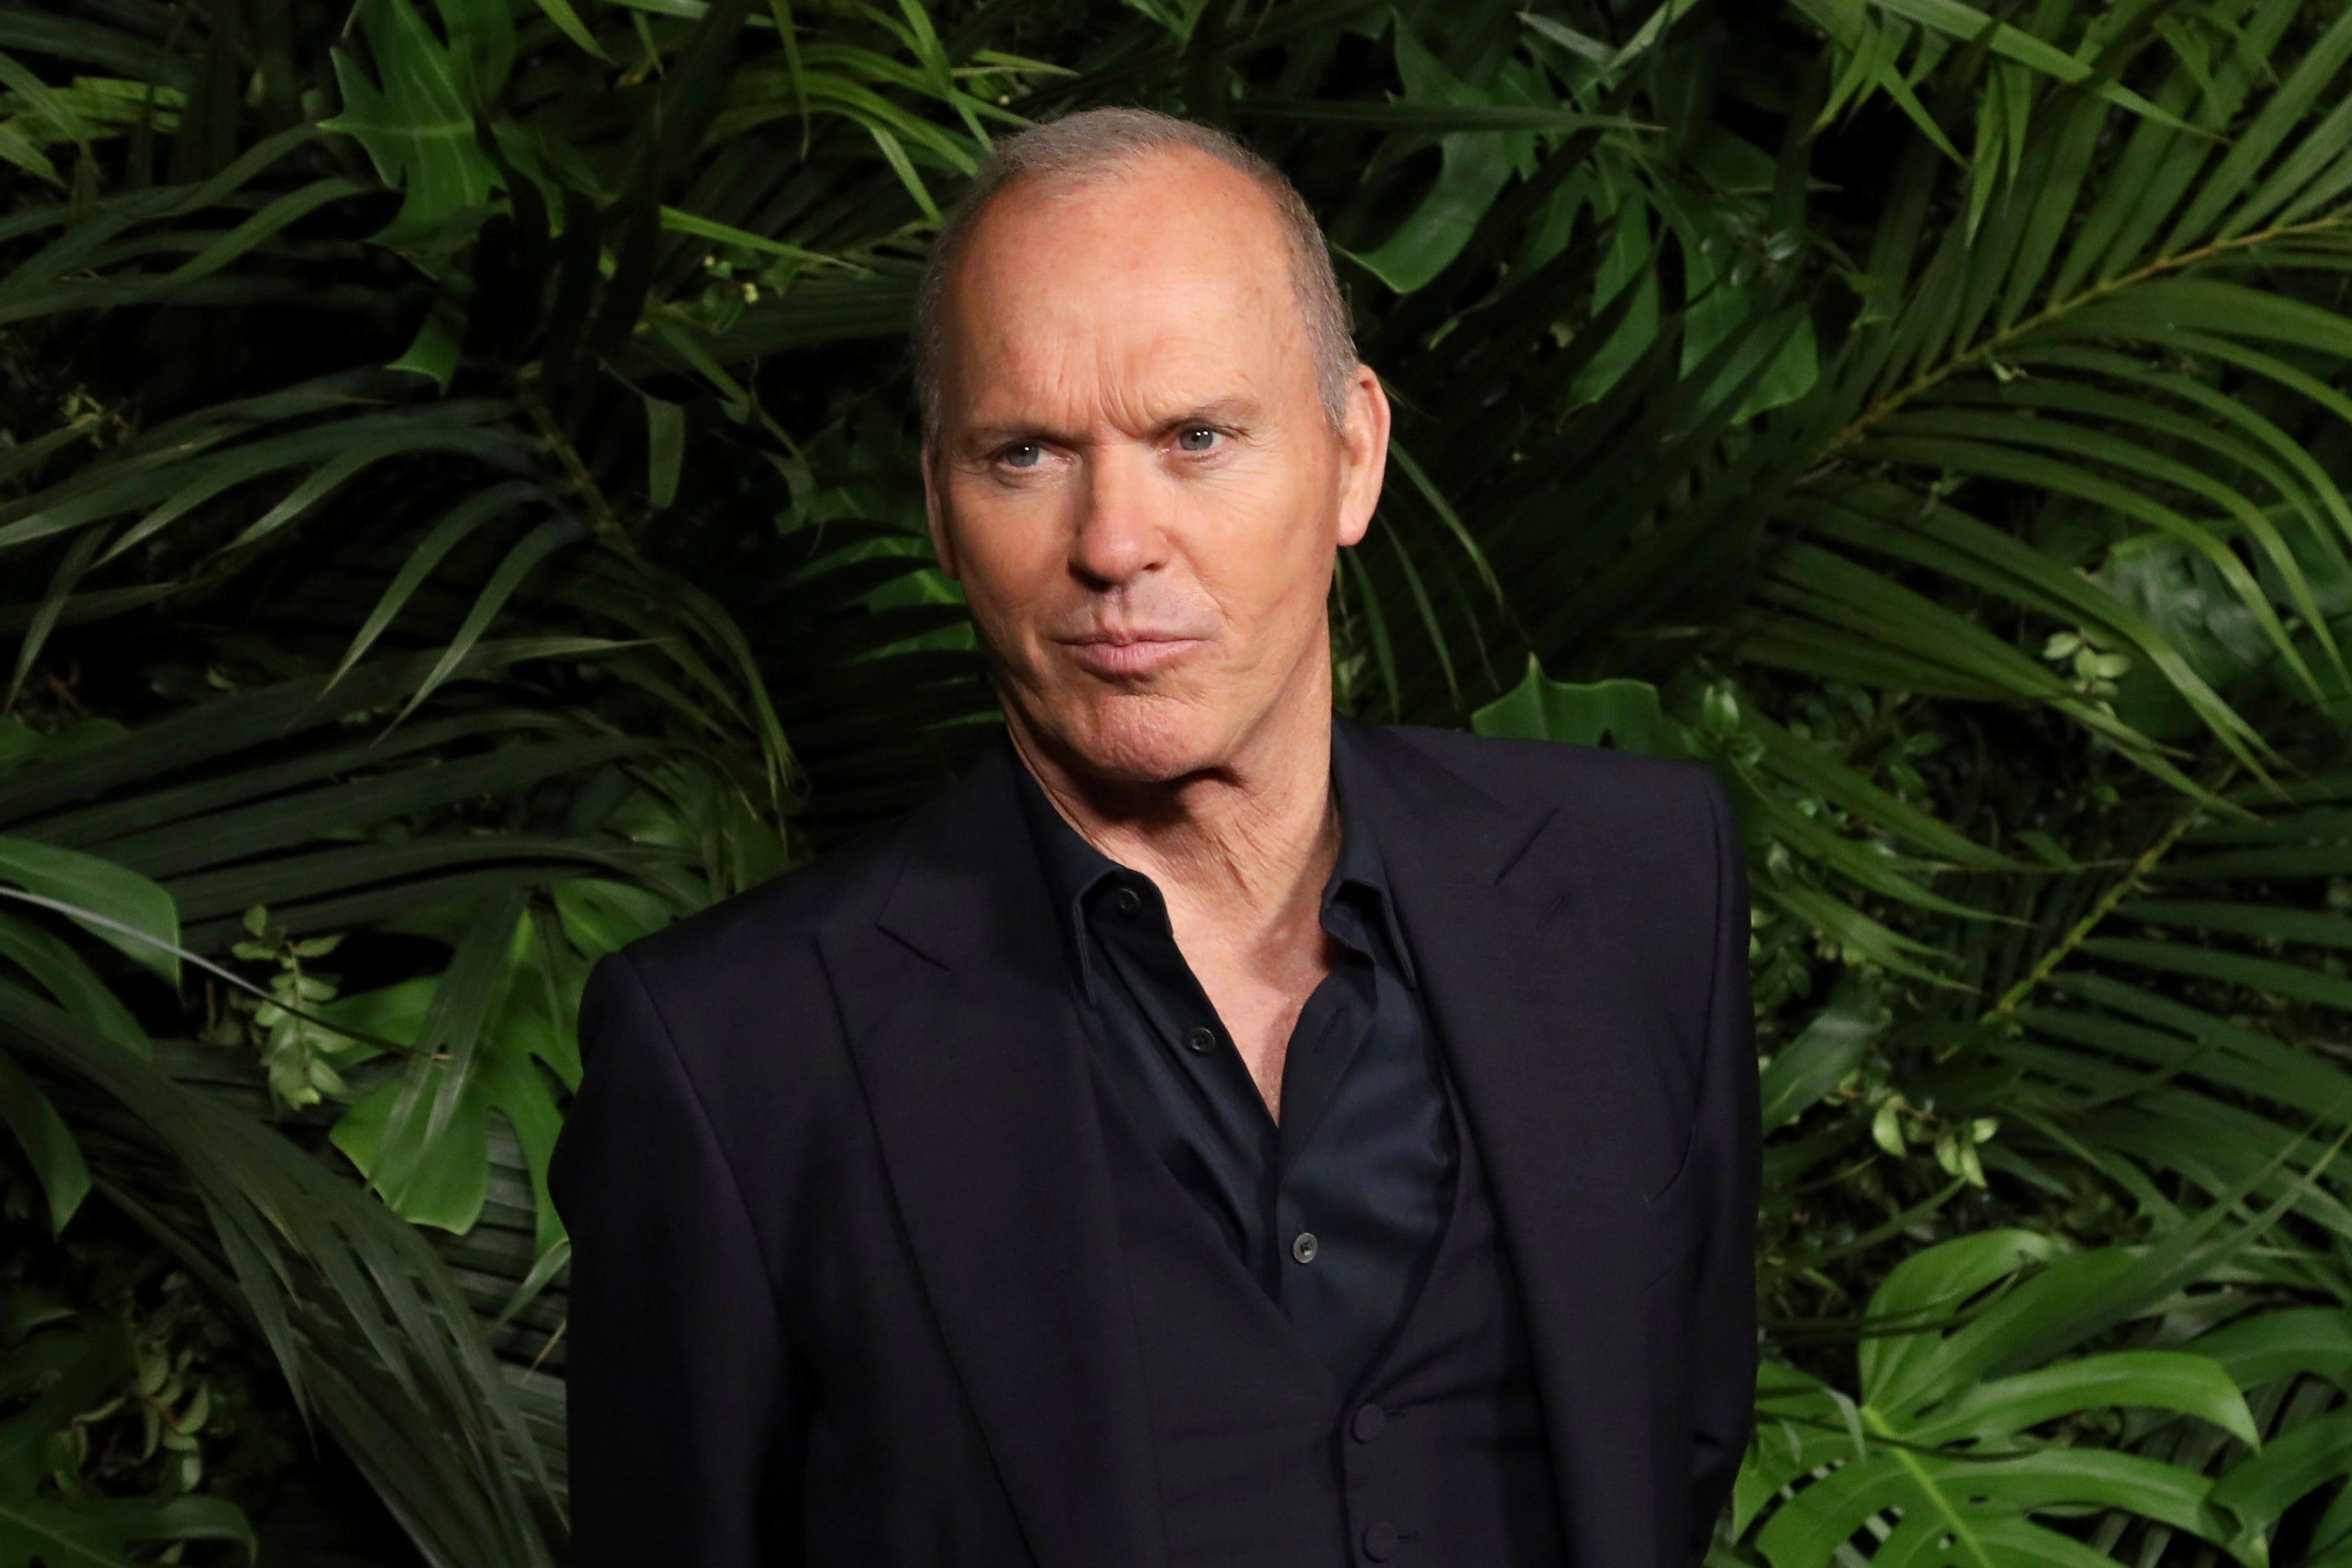 Michael Keaton in Los Angeles in 2020.